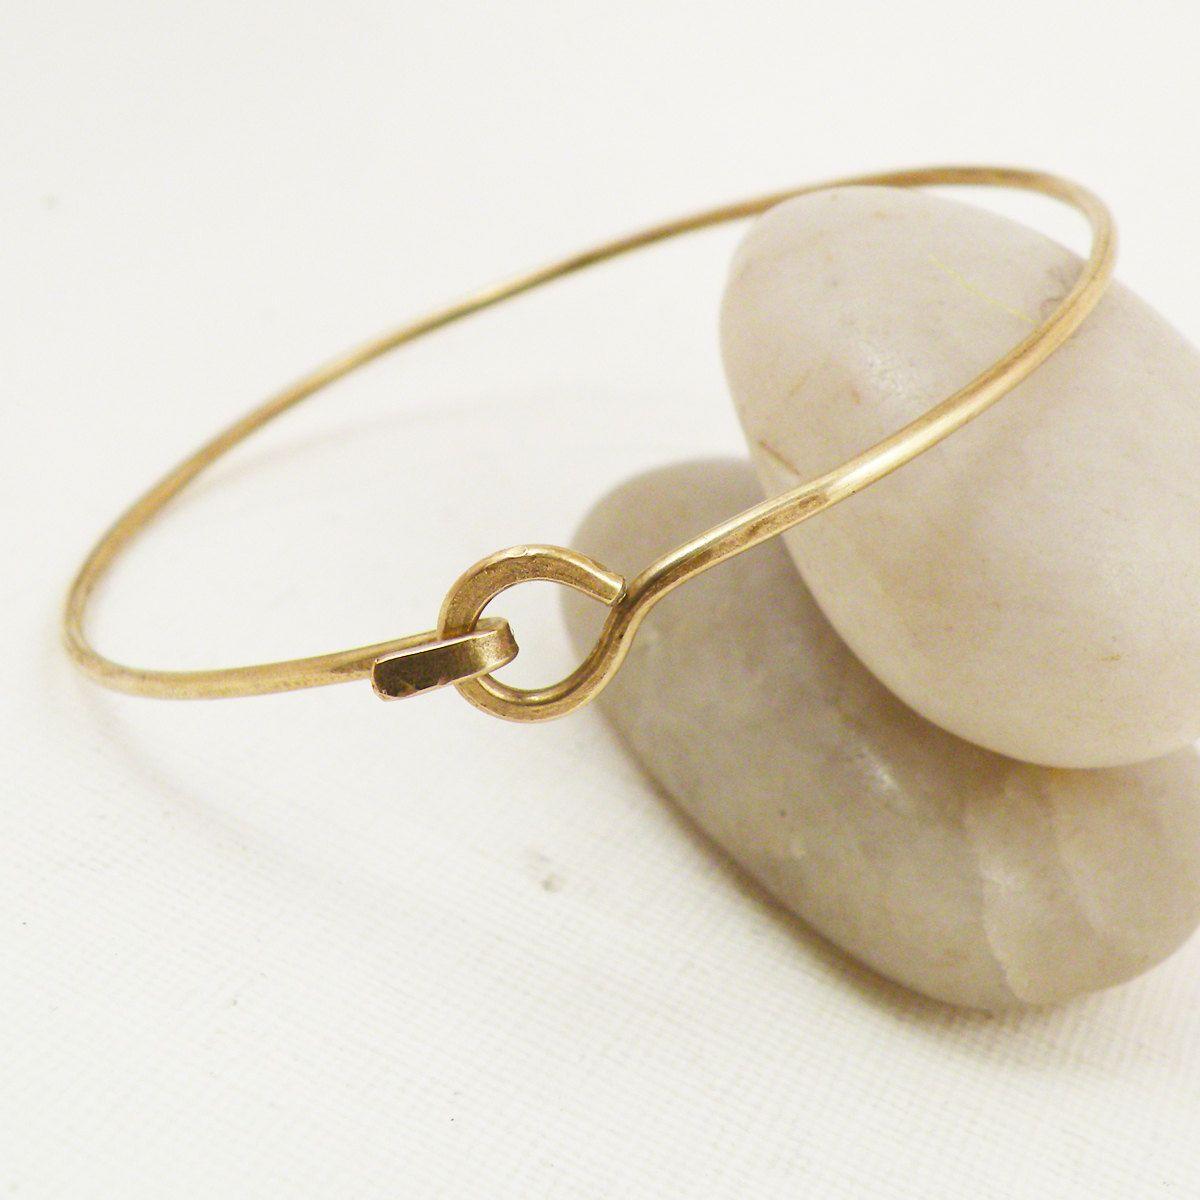 Hammered Bangle Bracelet Hook and Latch Minimalist Brass Jewelry ...